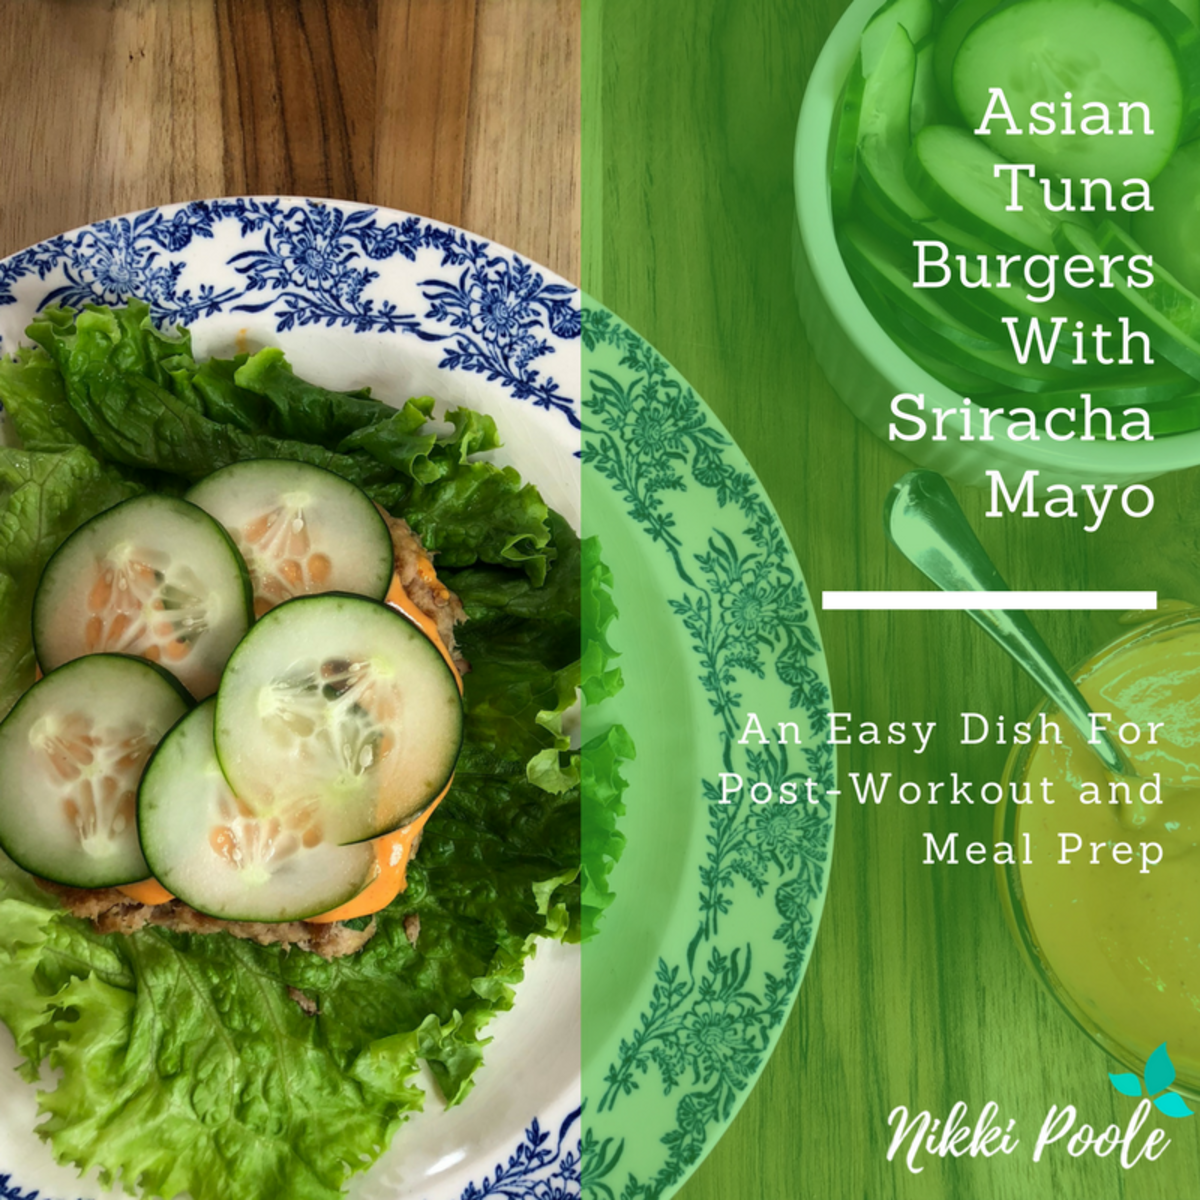 How to Make Low-Carb Asian Tuna Burgers With Sriracha Mayo